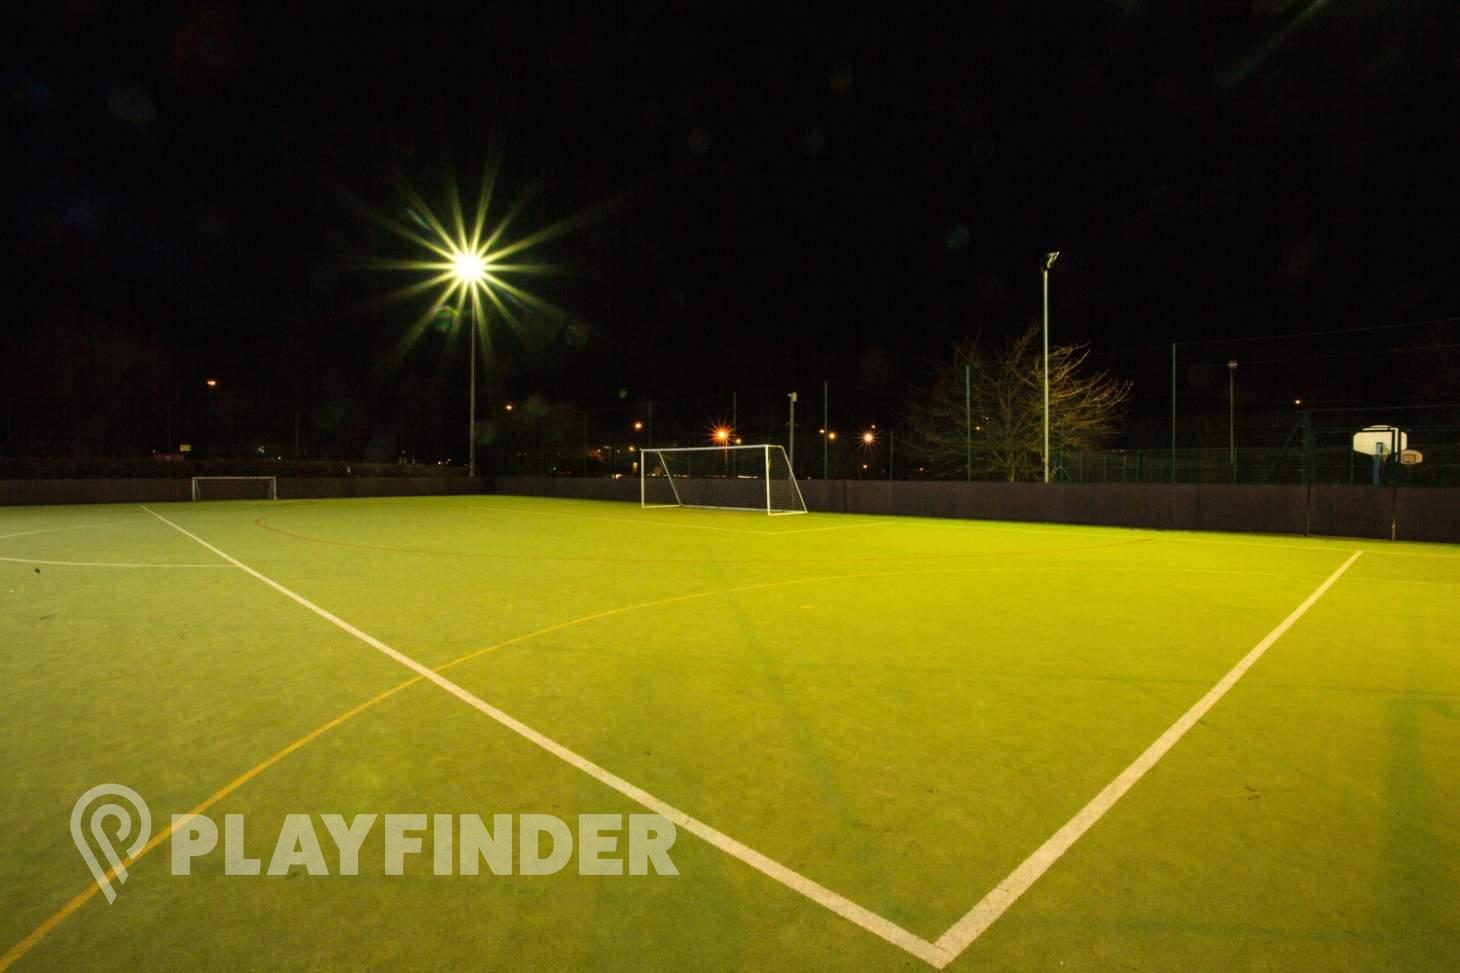 Brentside High School Outdoor | Astroturf hockey pitch